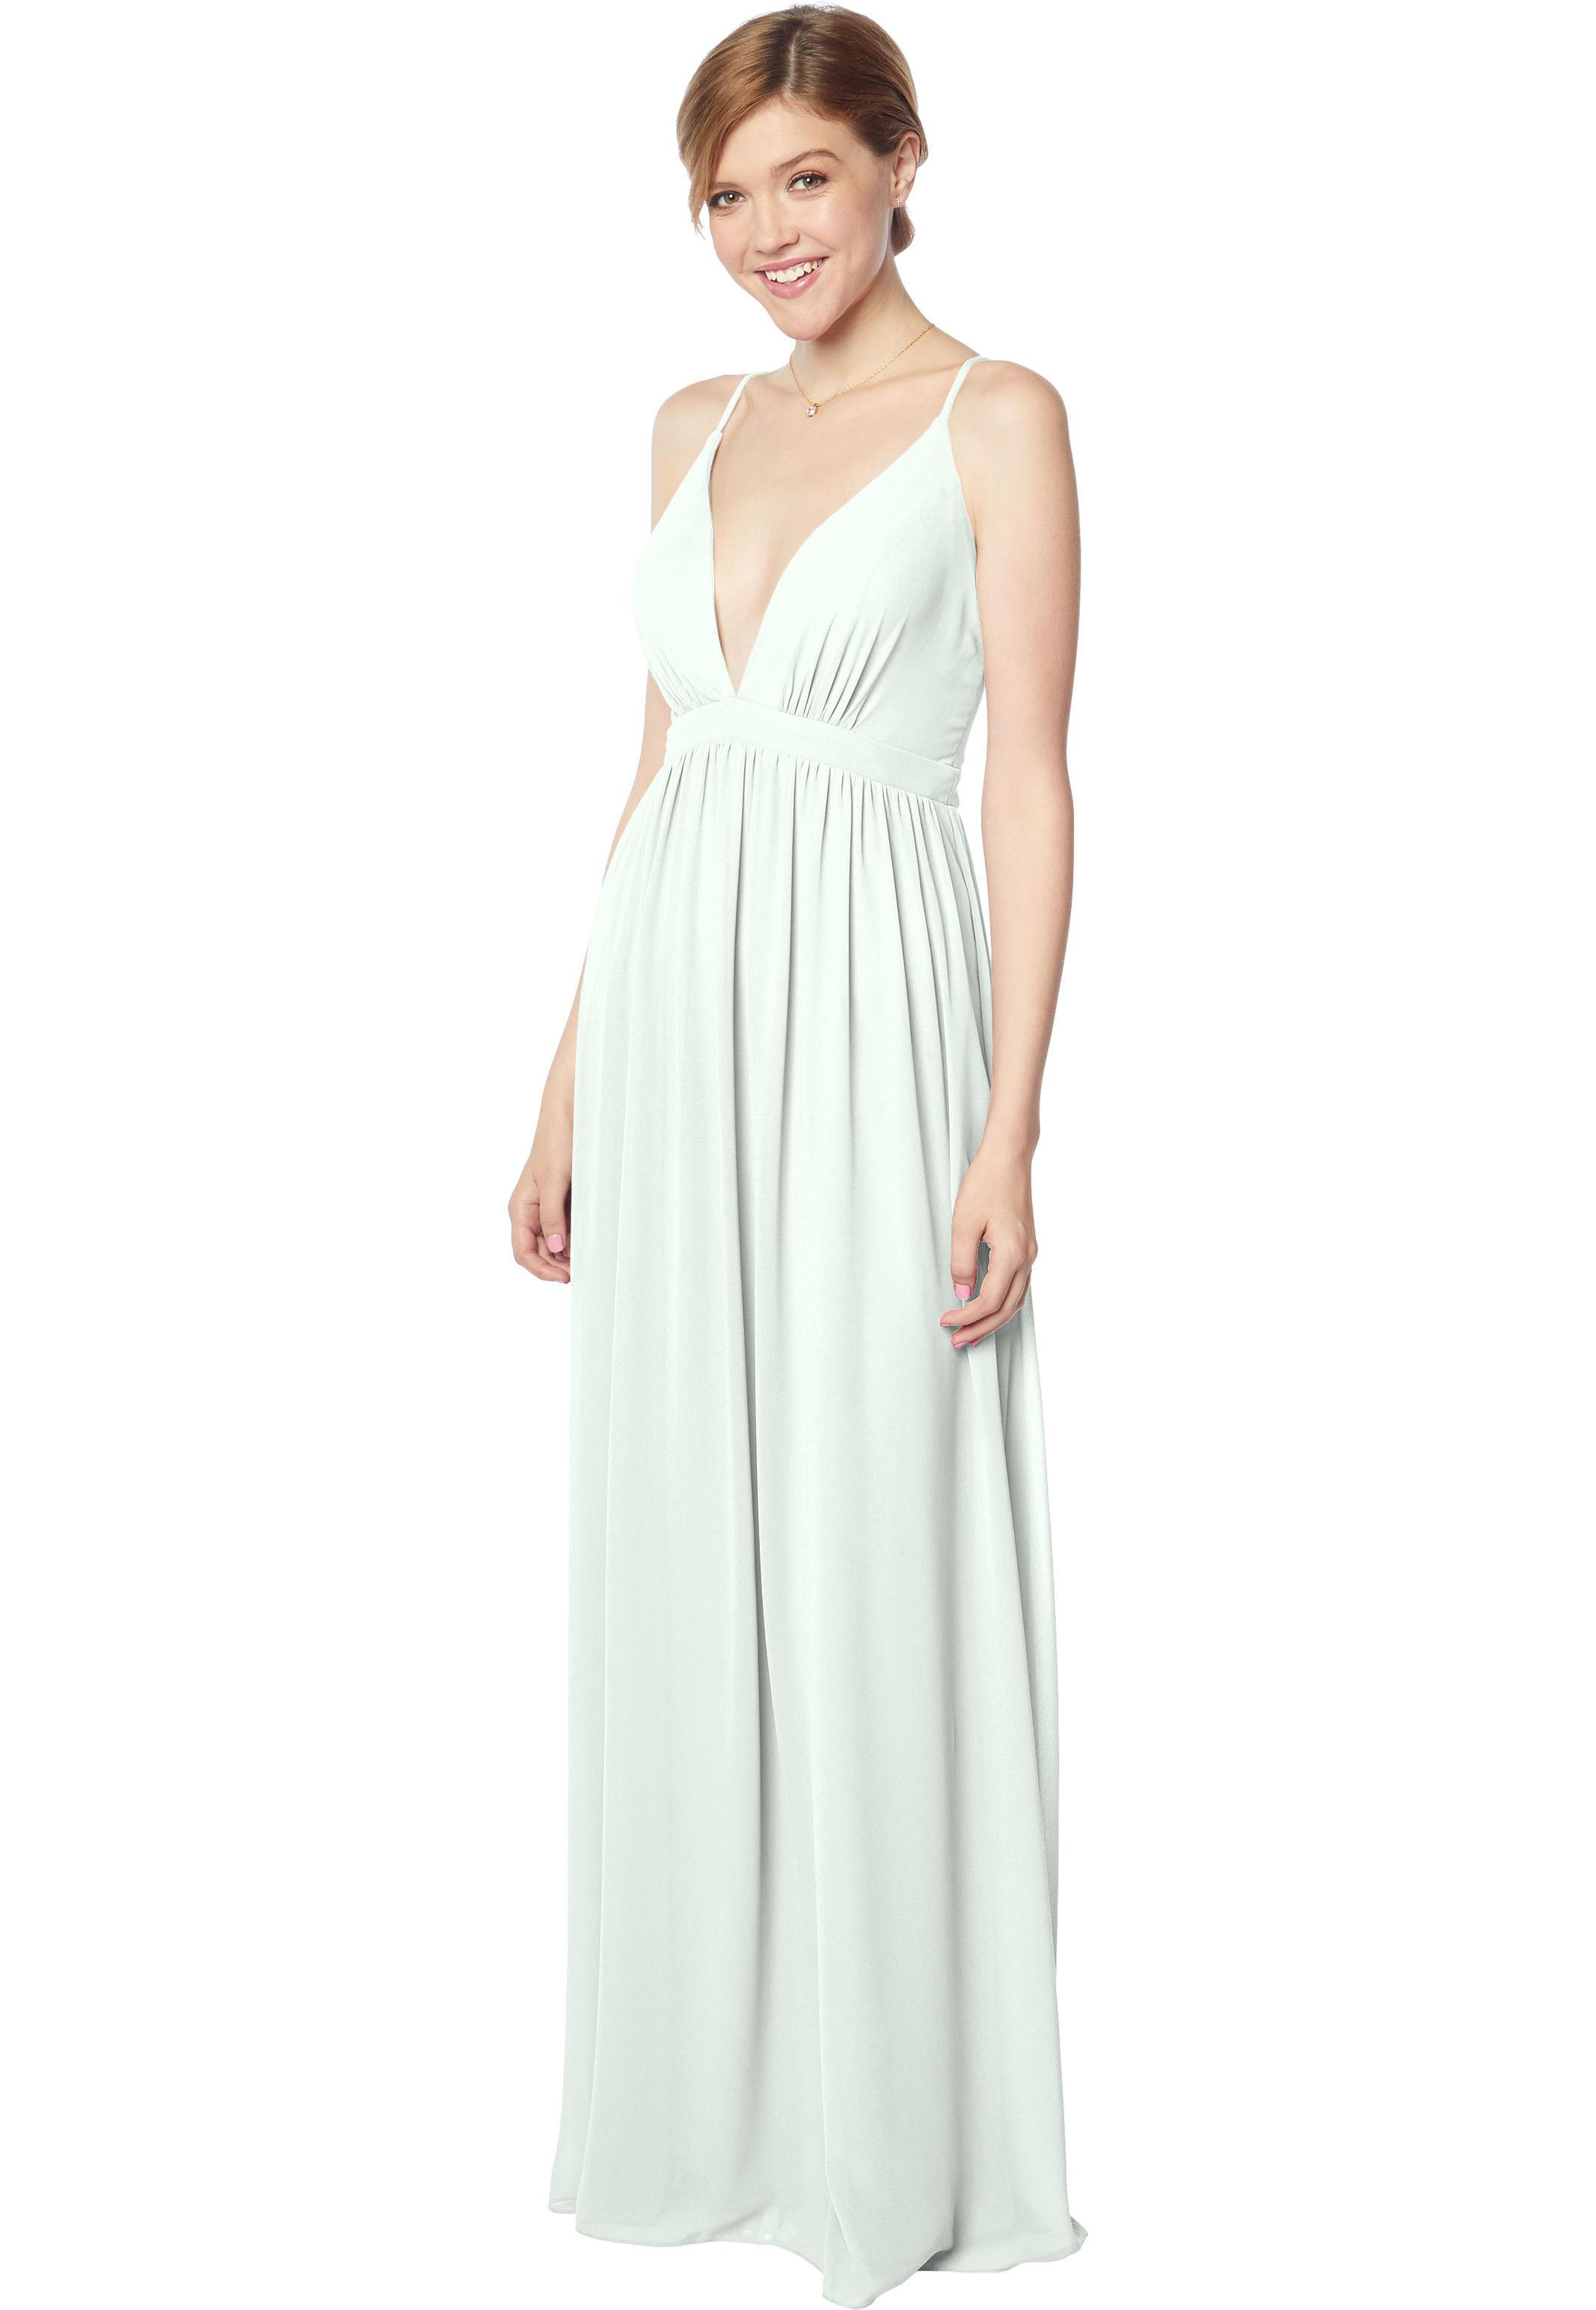 Bill Levkoff SEA FOAM Chiffon V-neck A-line gown, $170.00 Front